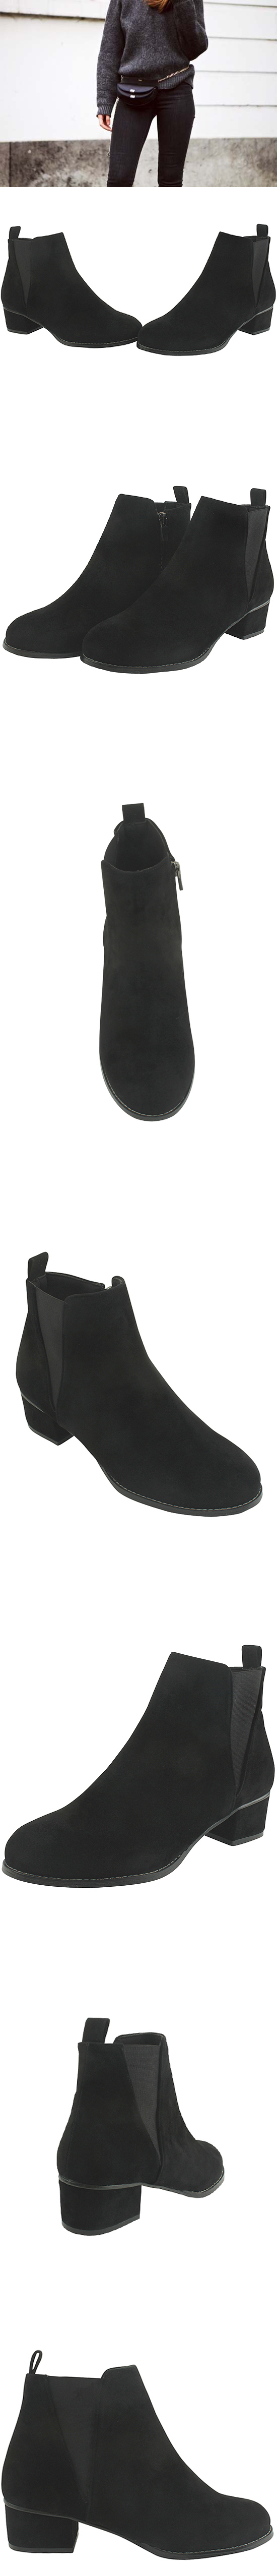 Low Heel Full Heel Chelsea Ankle Boots Black